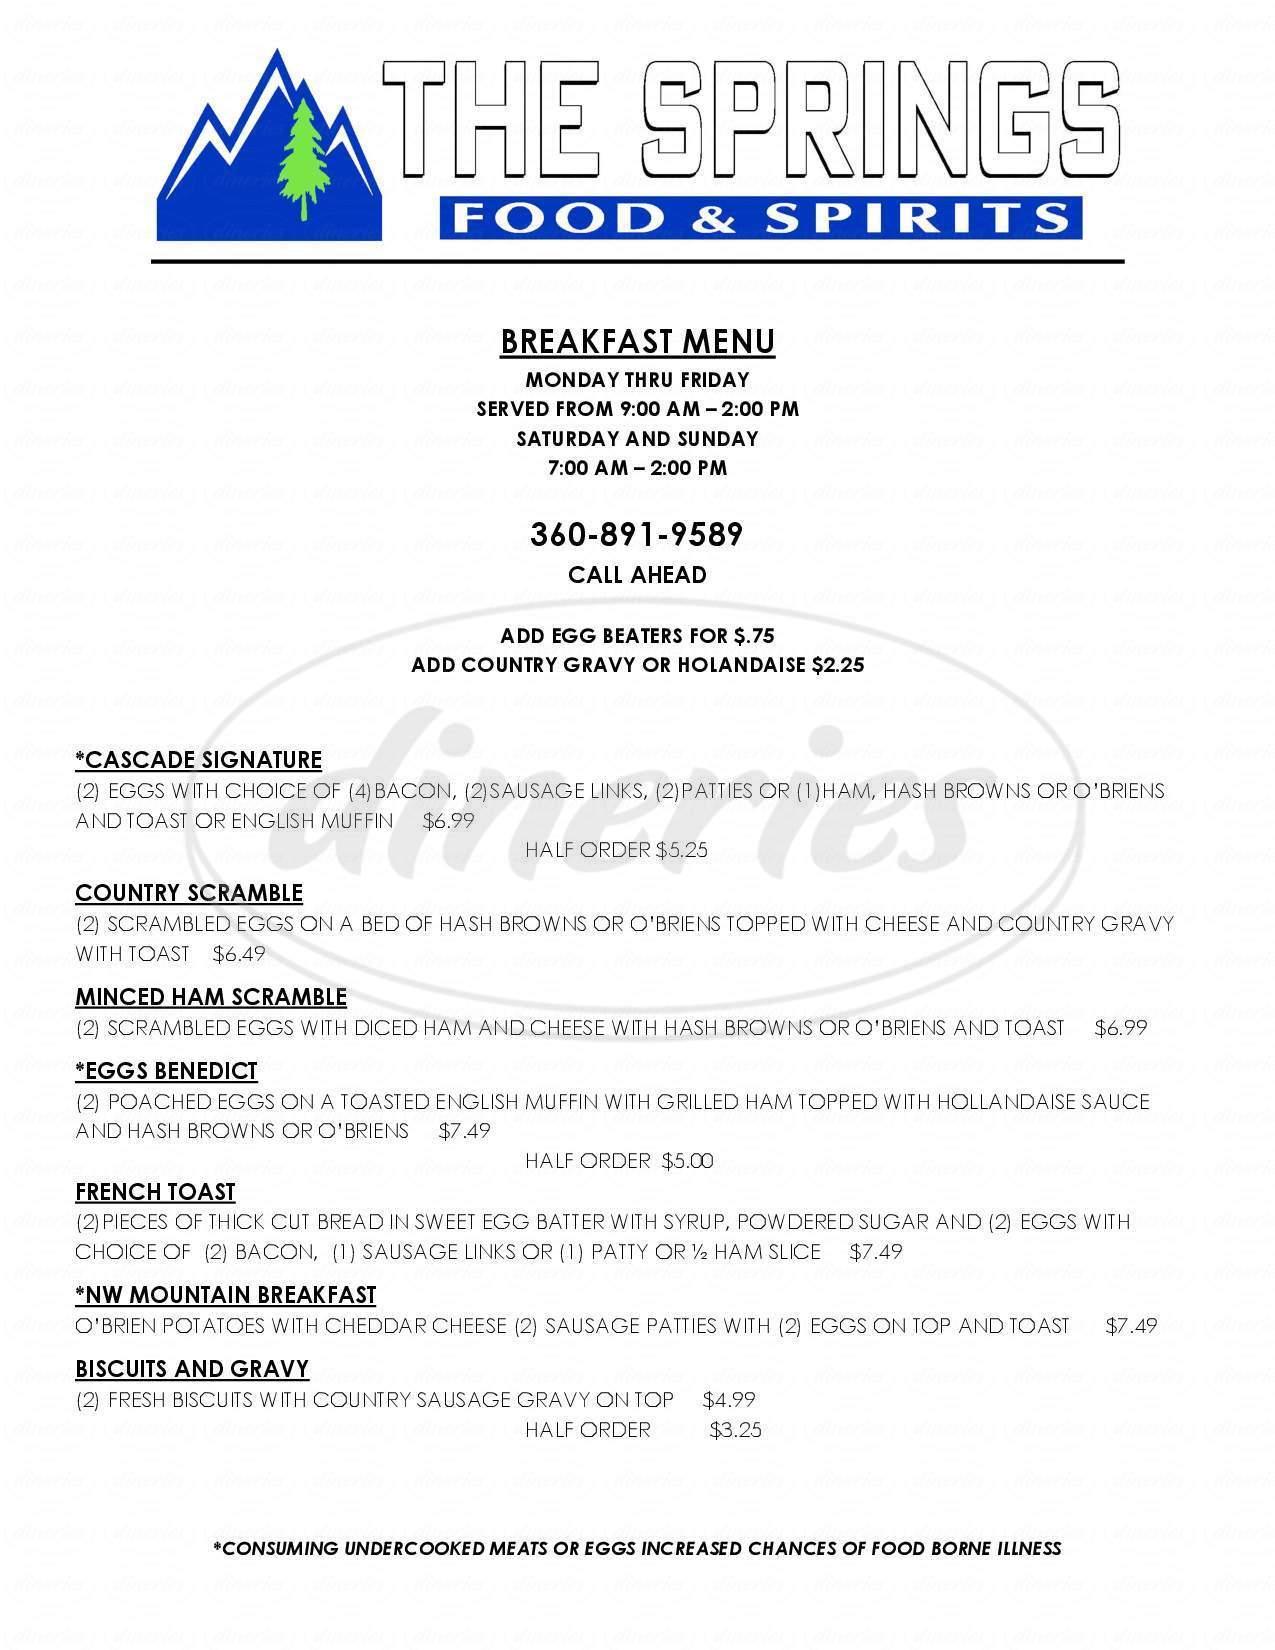 menu for The Springs